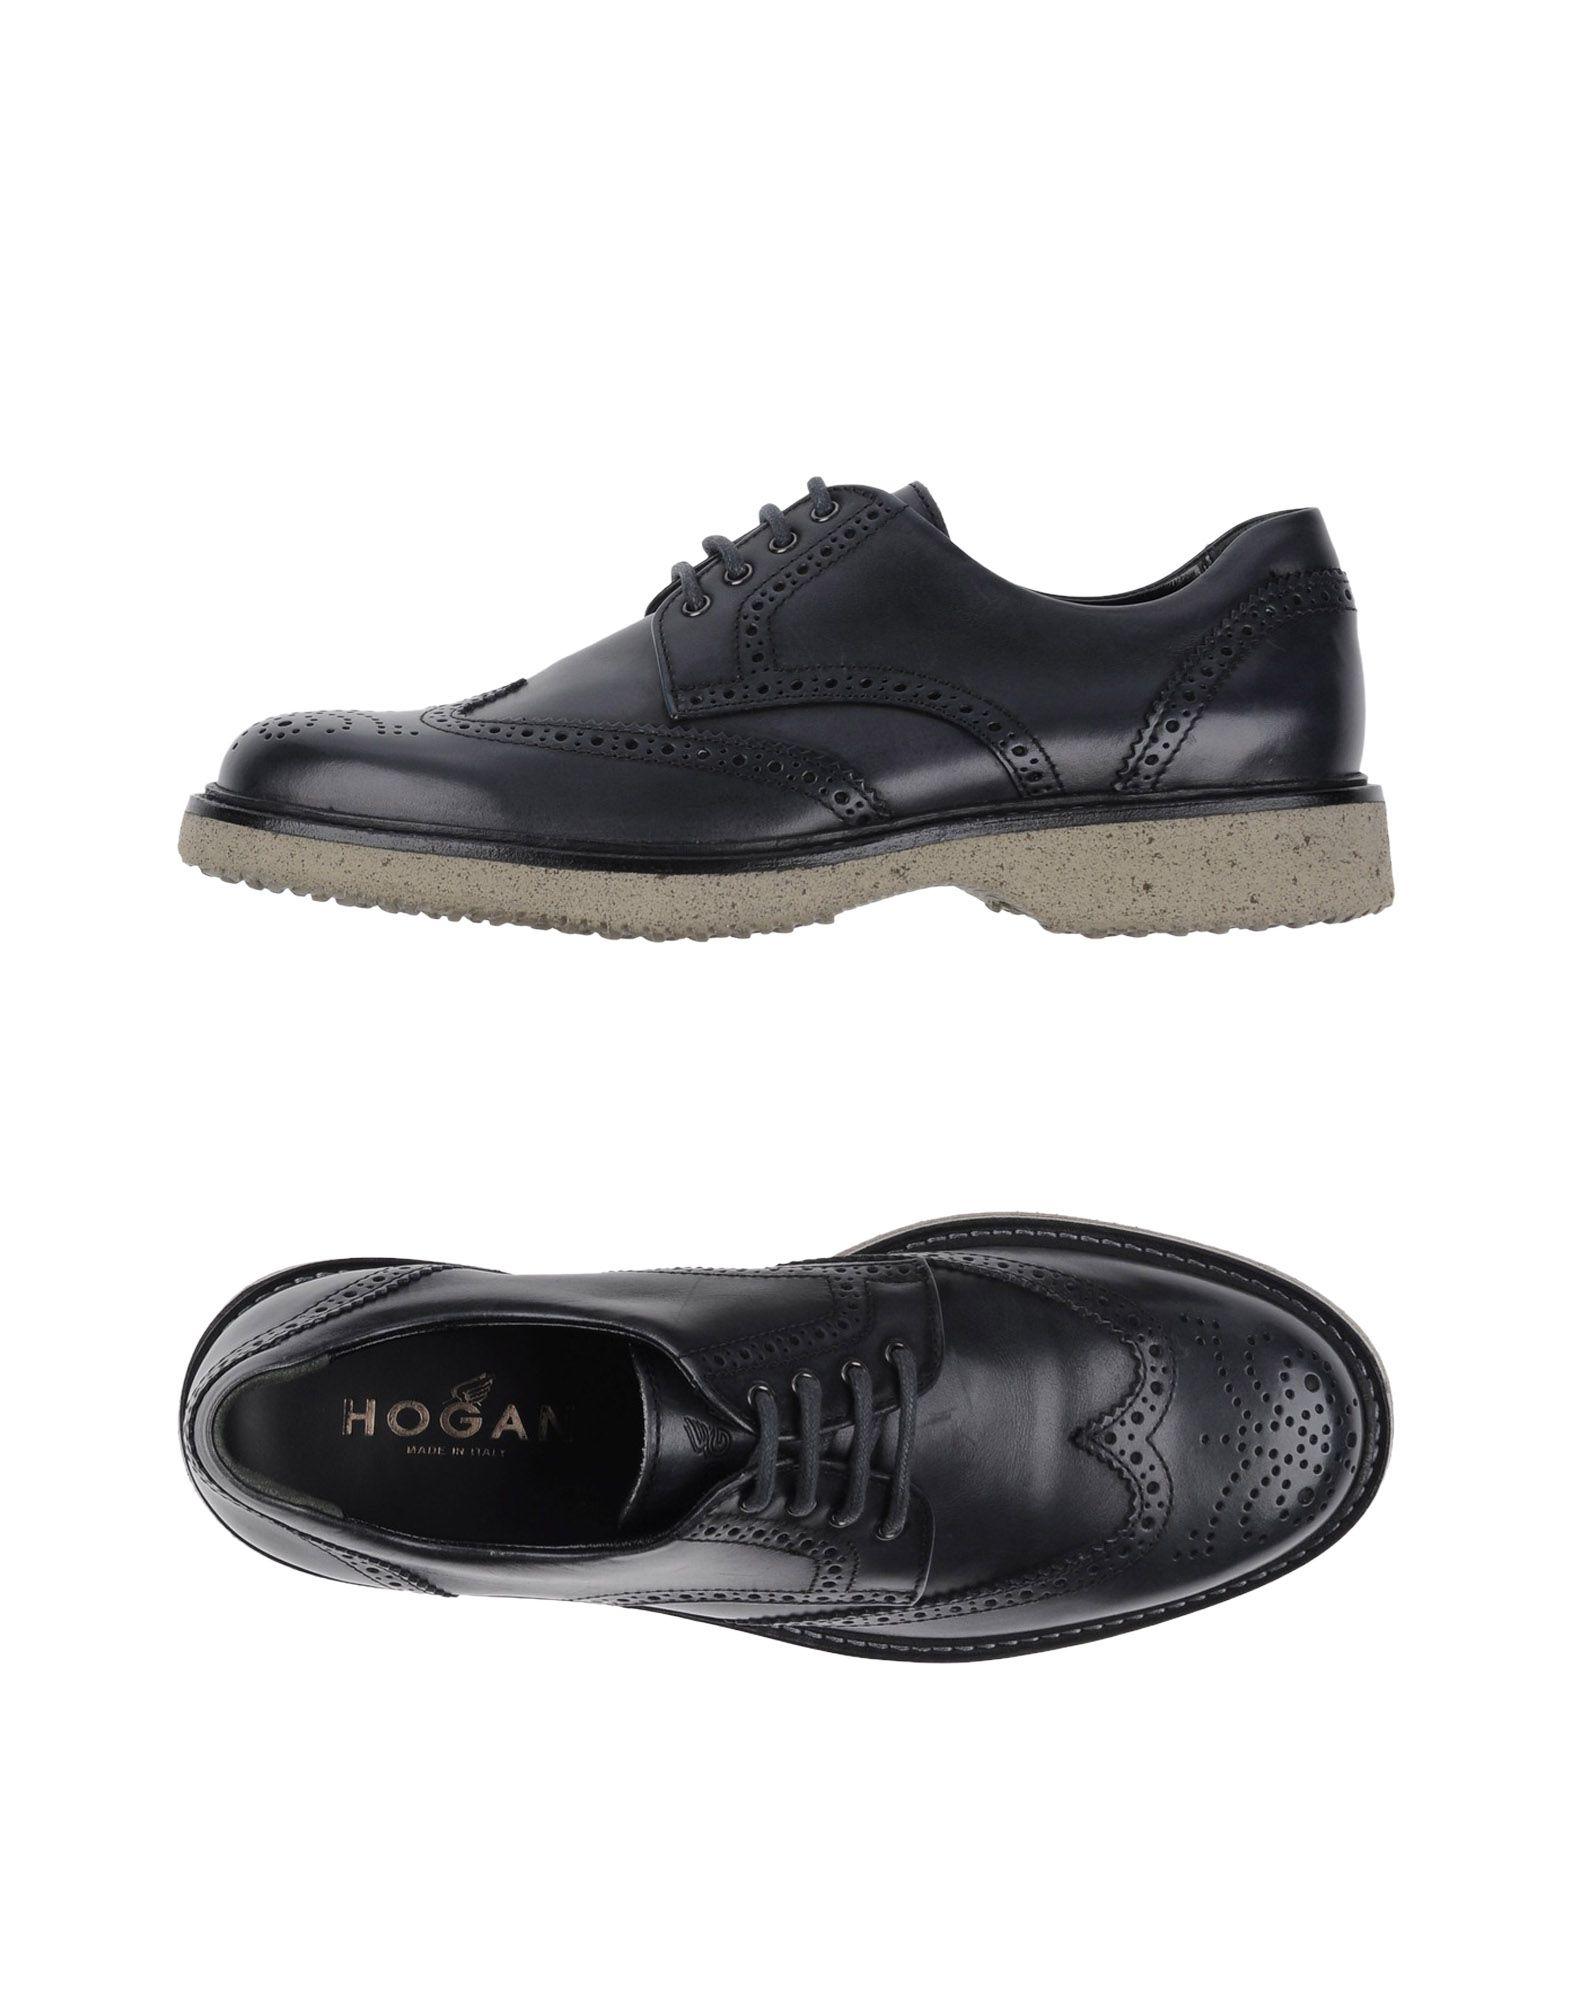 Hogan Schnürschuhe Herren  11176166QR Gute Qualität beliebte Schuhe